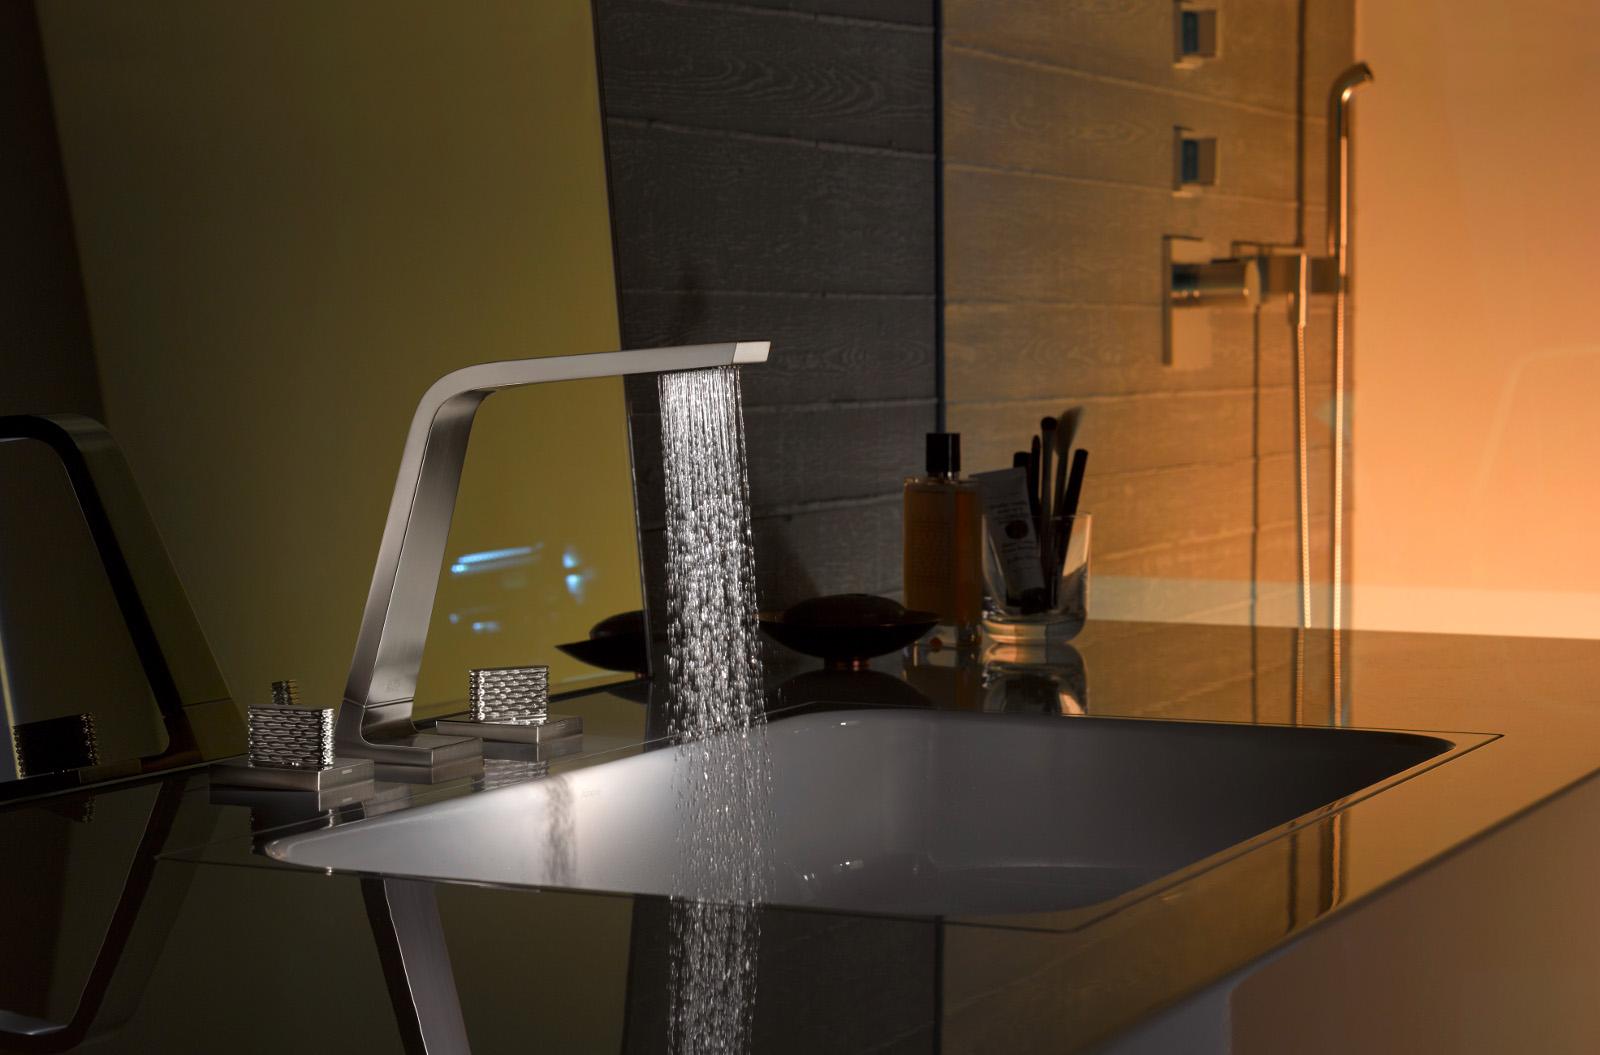 cl 1 dornbracht the panday group bathroom collection. Black Bedroom Furniture Sets. Home Design Ideas